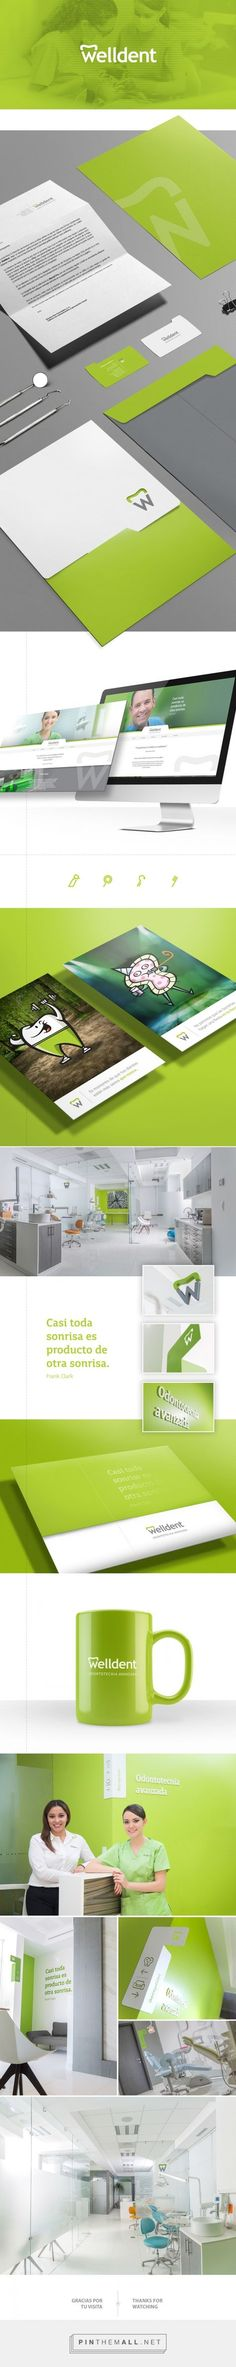 Welldent, dentist brand identity by Diseño Dos Asociados #branding #stationary #inspiration